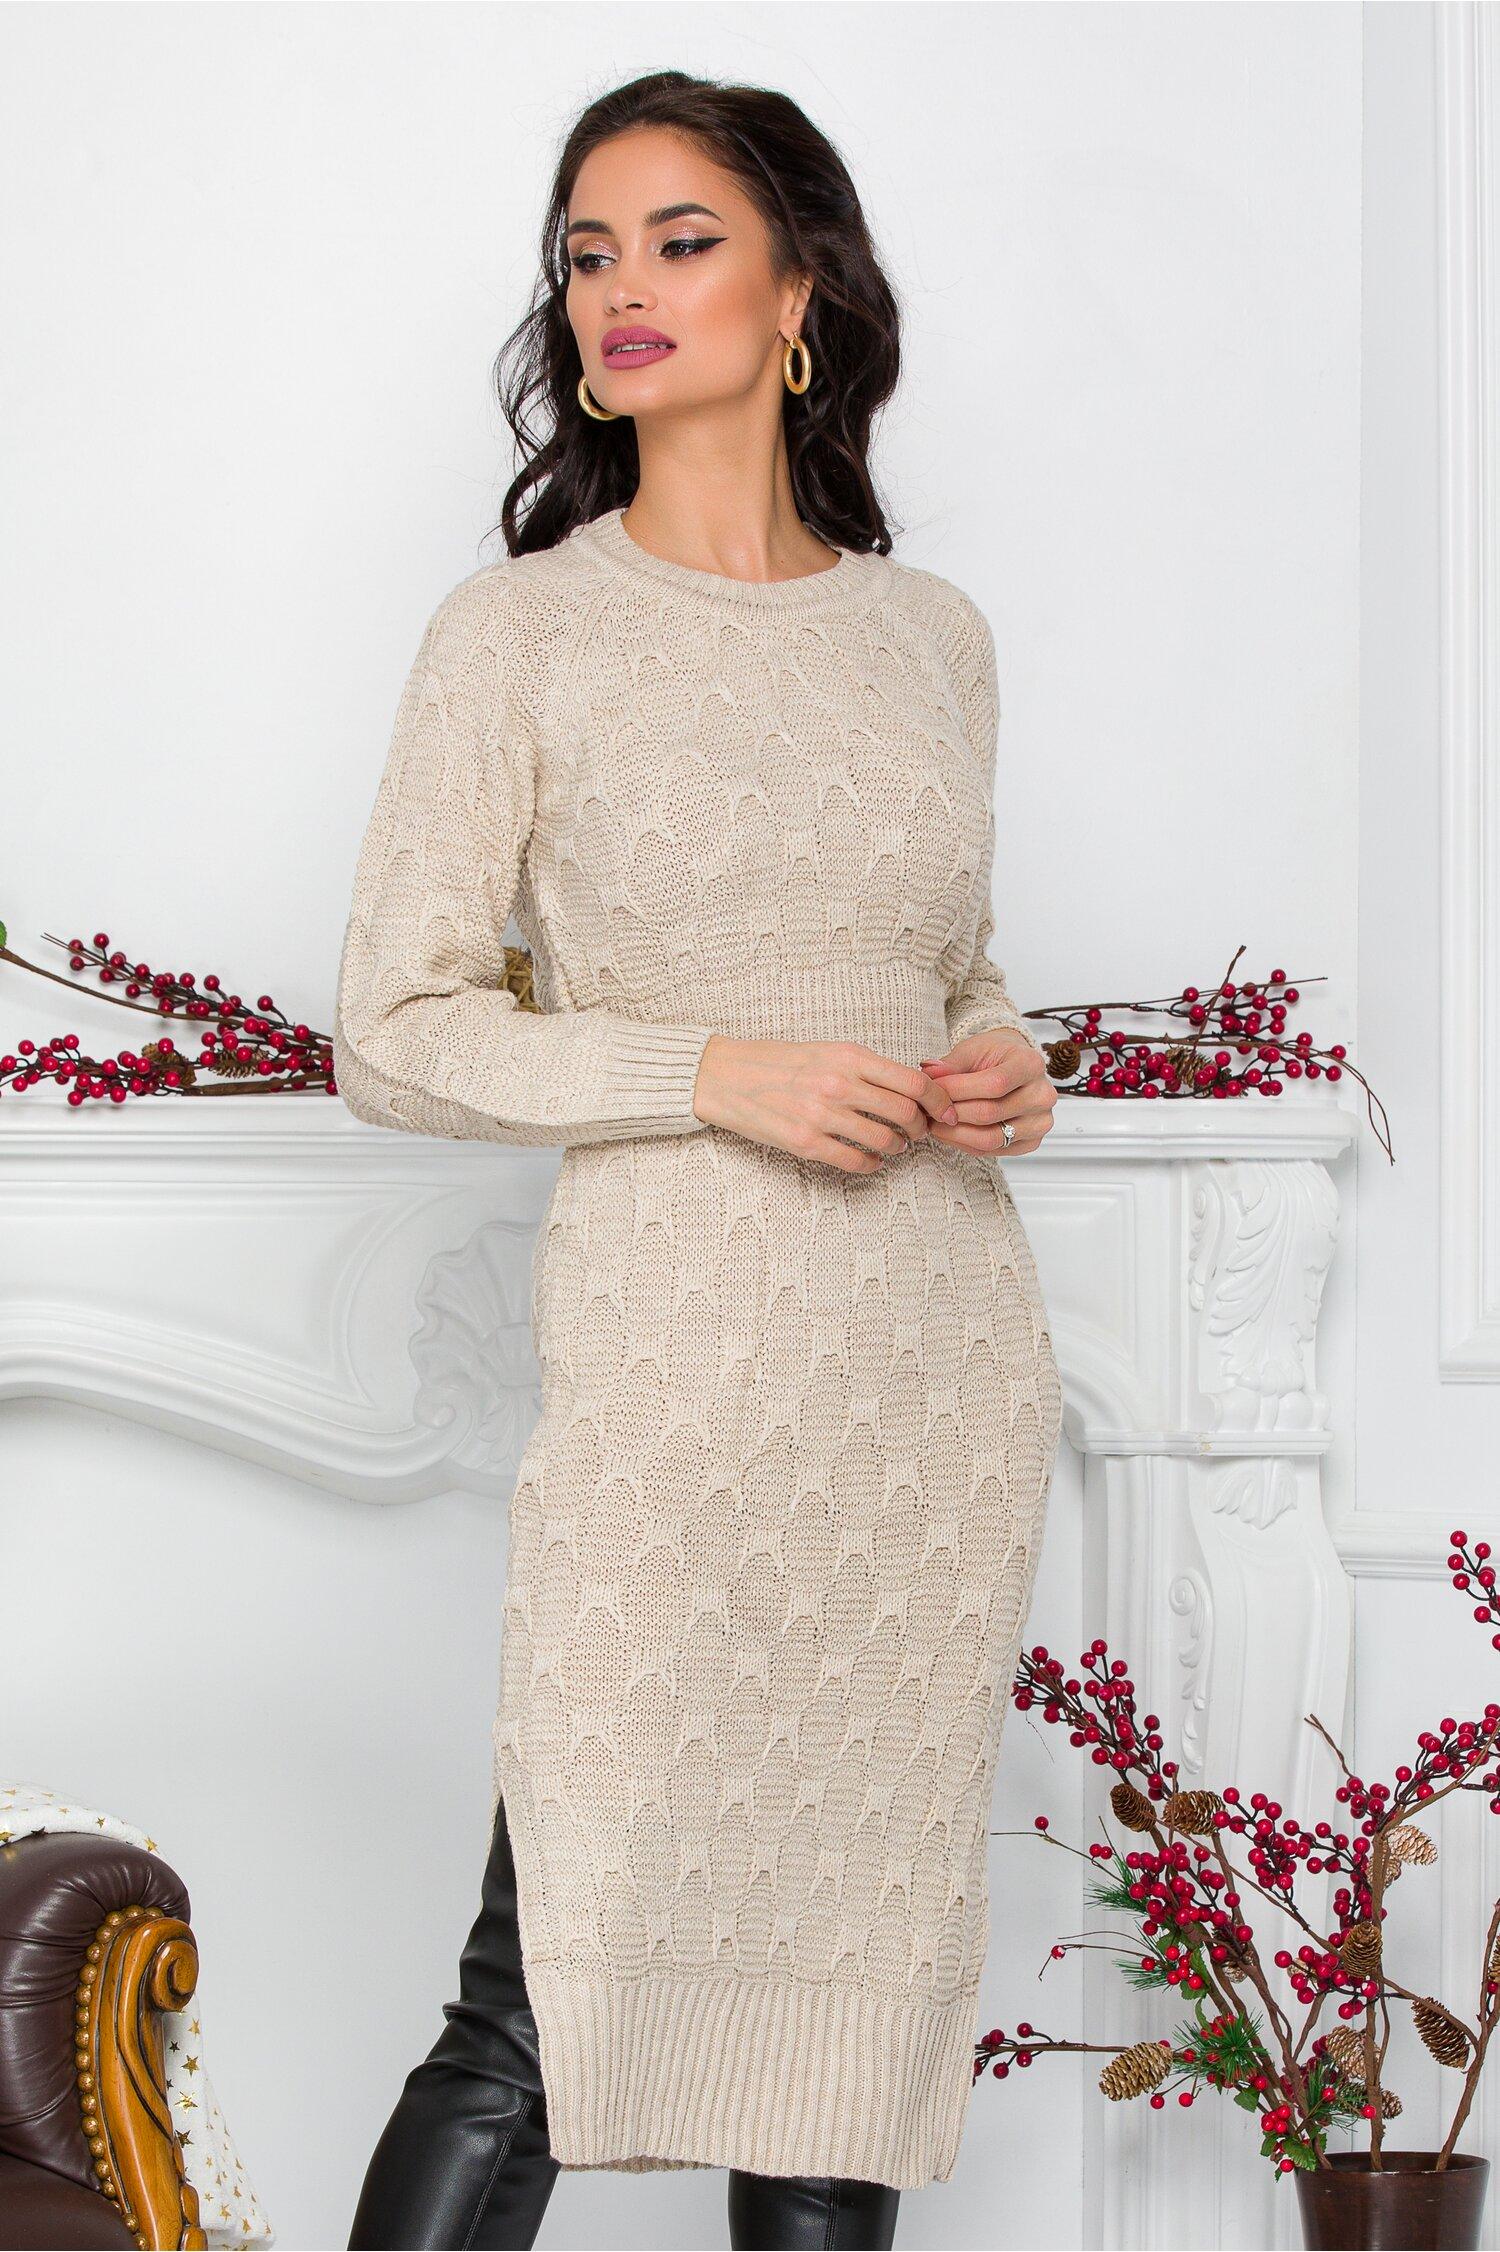 Rochie Nicolle ivory din tricot cu talia marcata